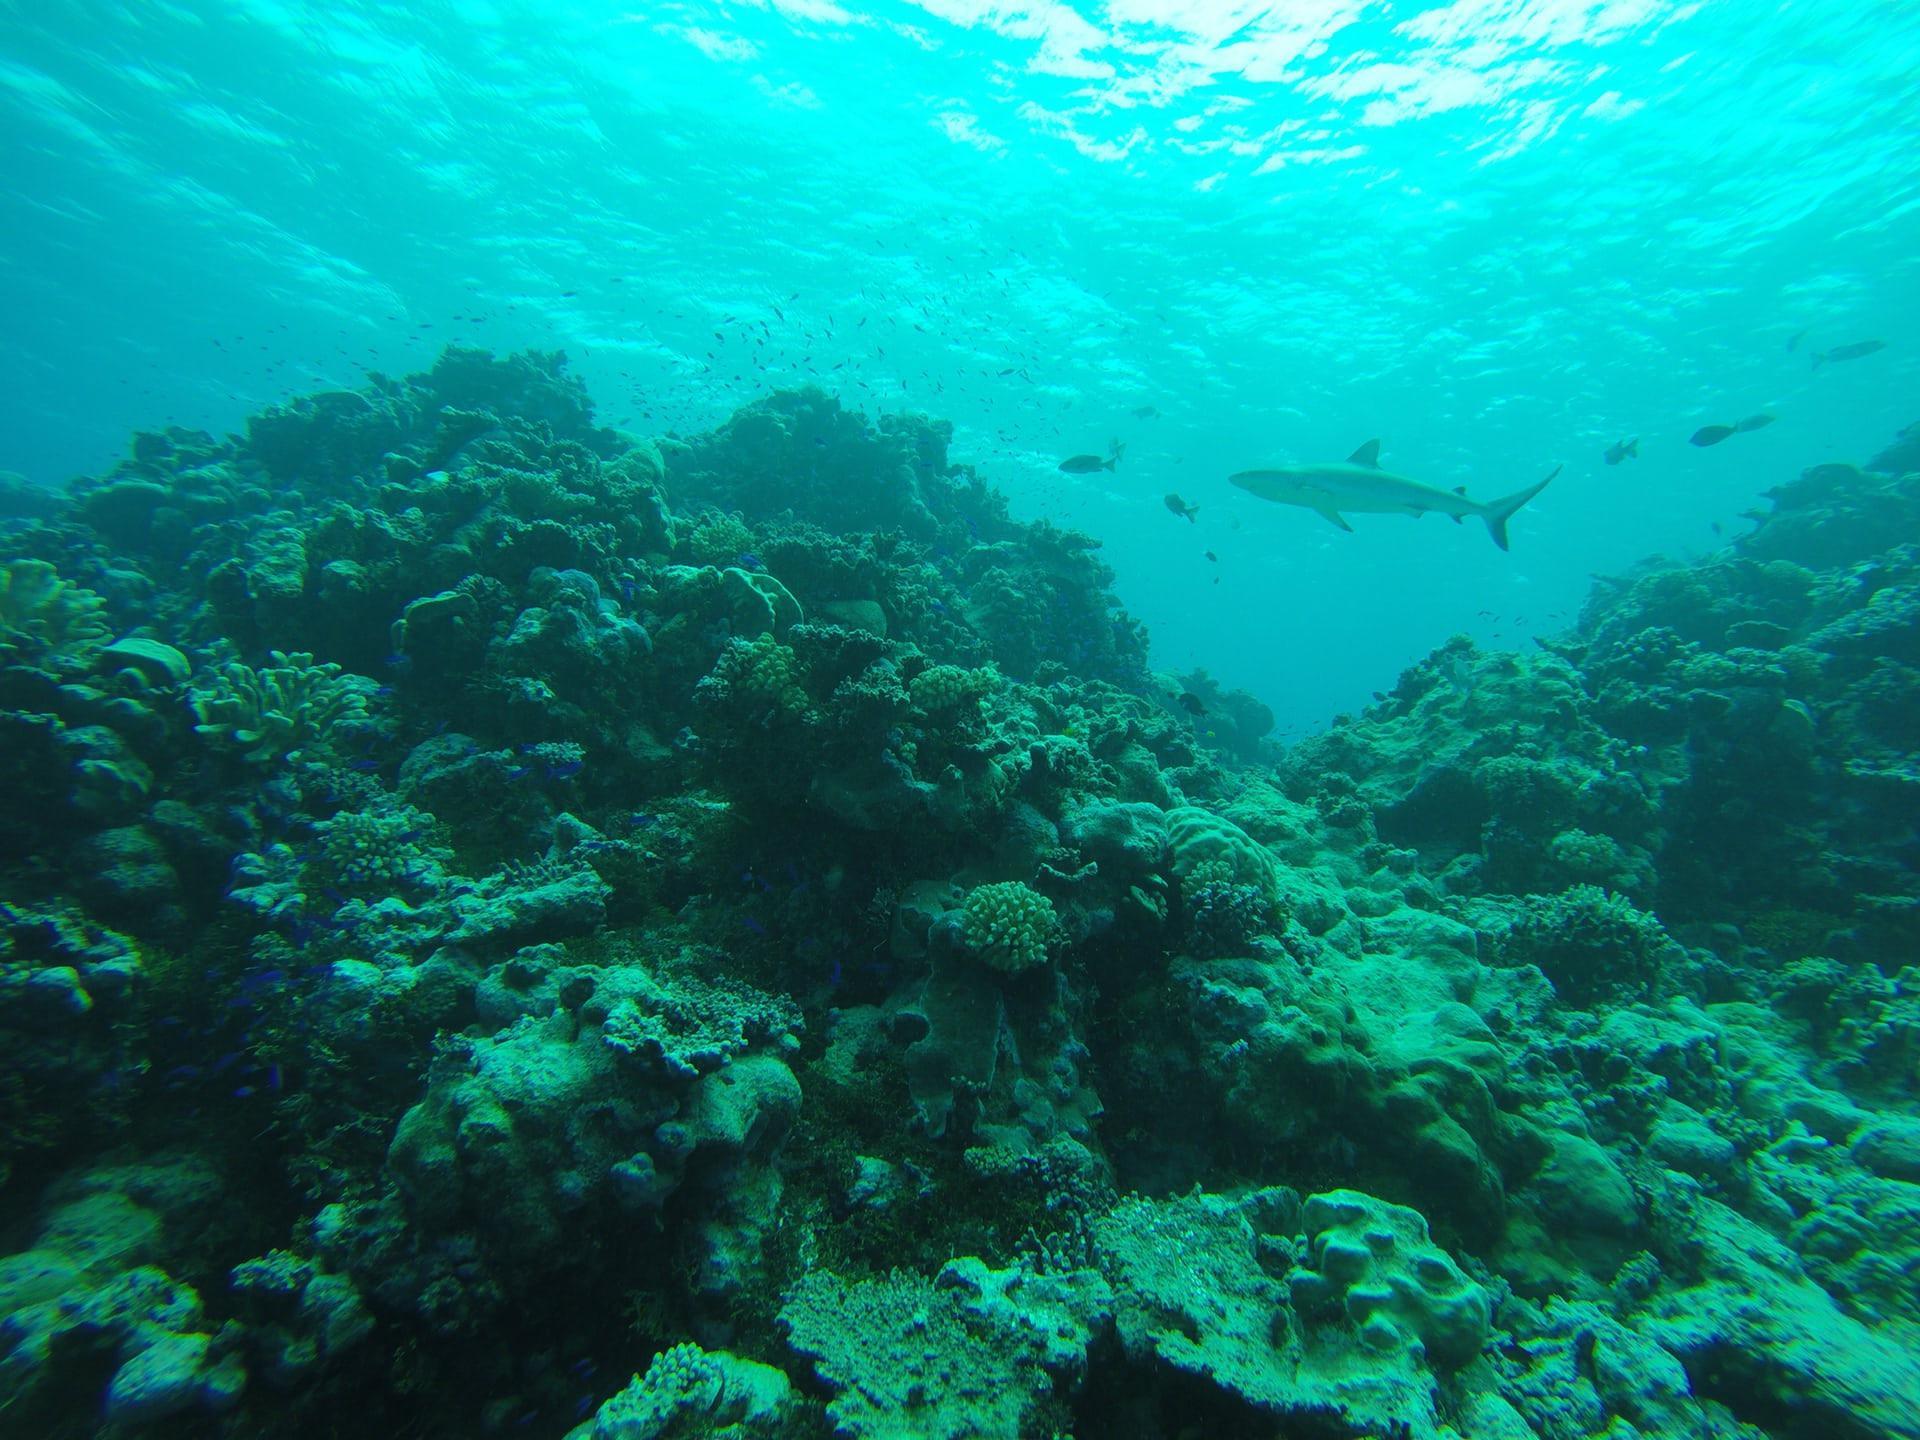 Kondisi biota laut di Bikini Atoll berdasarkan pengamatan ilmuwan Stanford University (Credit: Steve Palumbi)